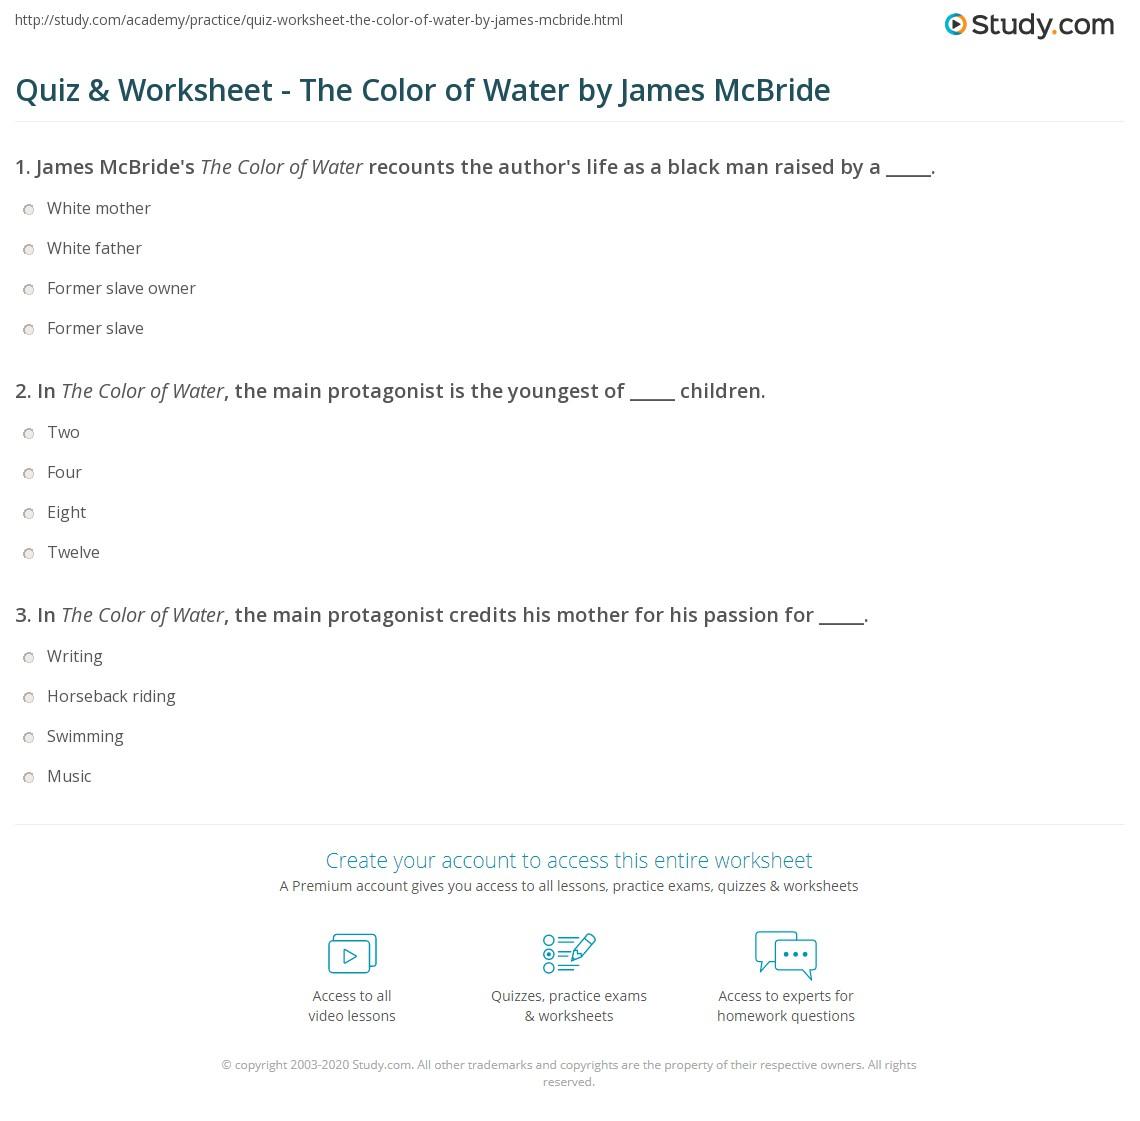 Quiz W Ksheet Col Of W Ter By J Mes Mcbride Study